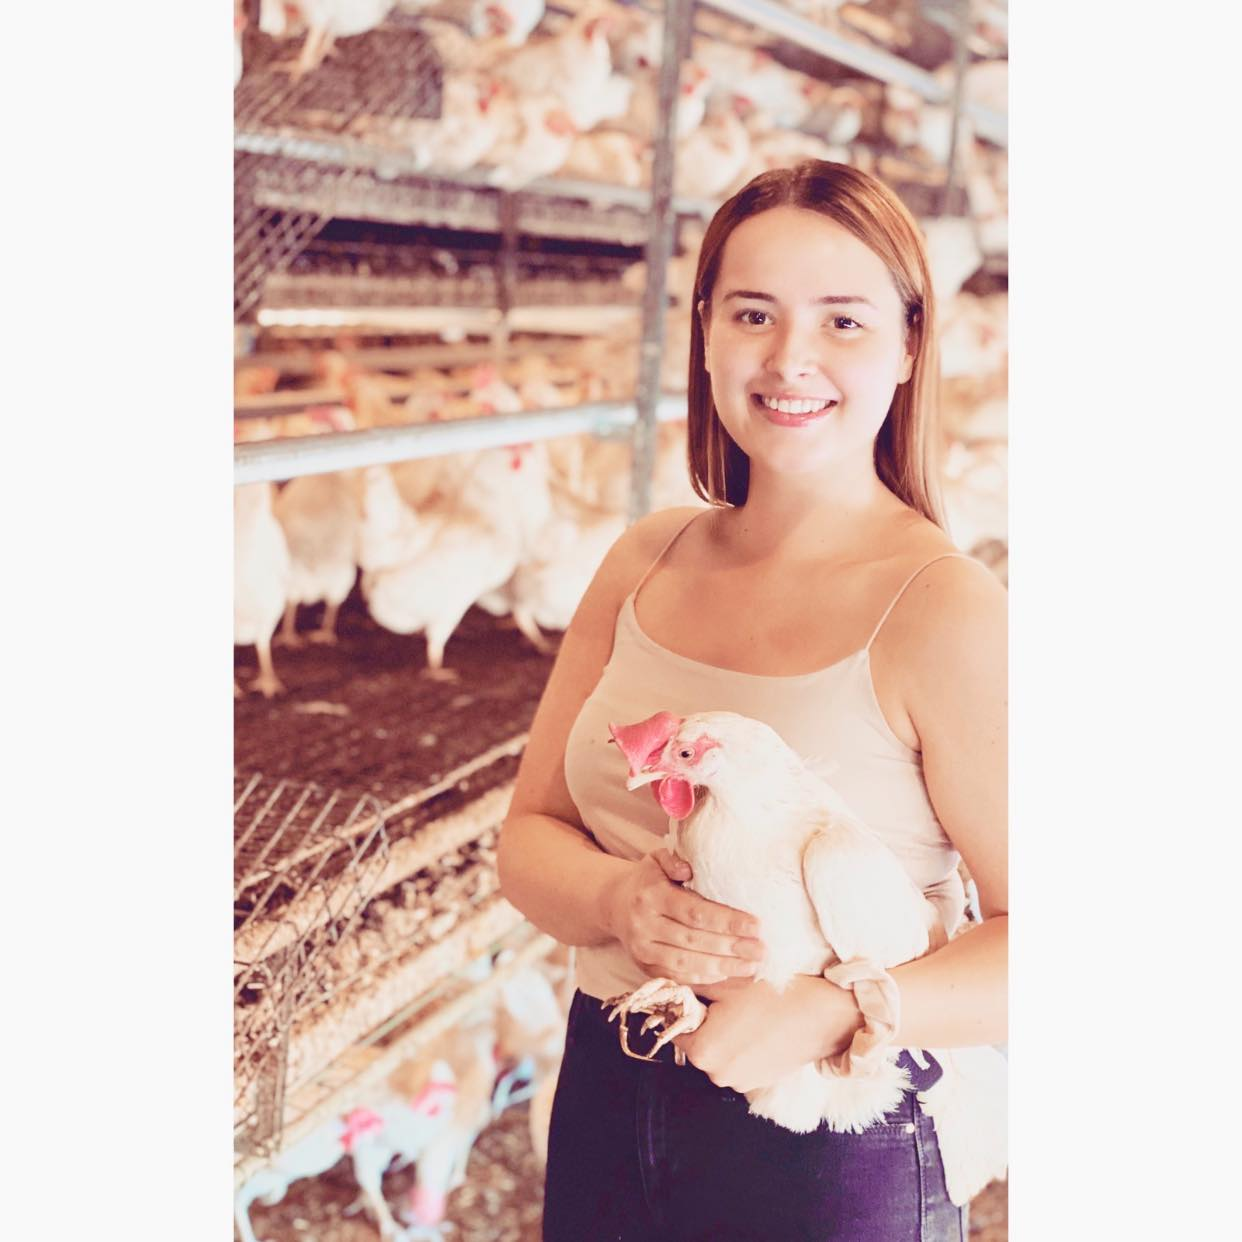 Clayewater Farms poultry farm